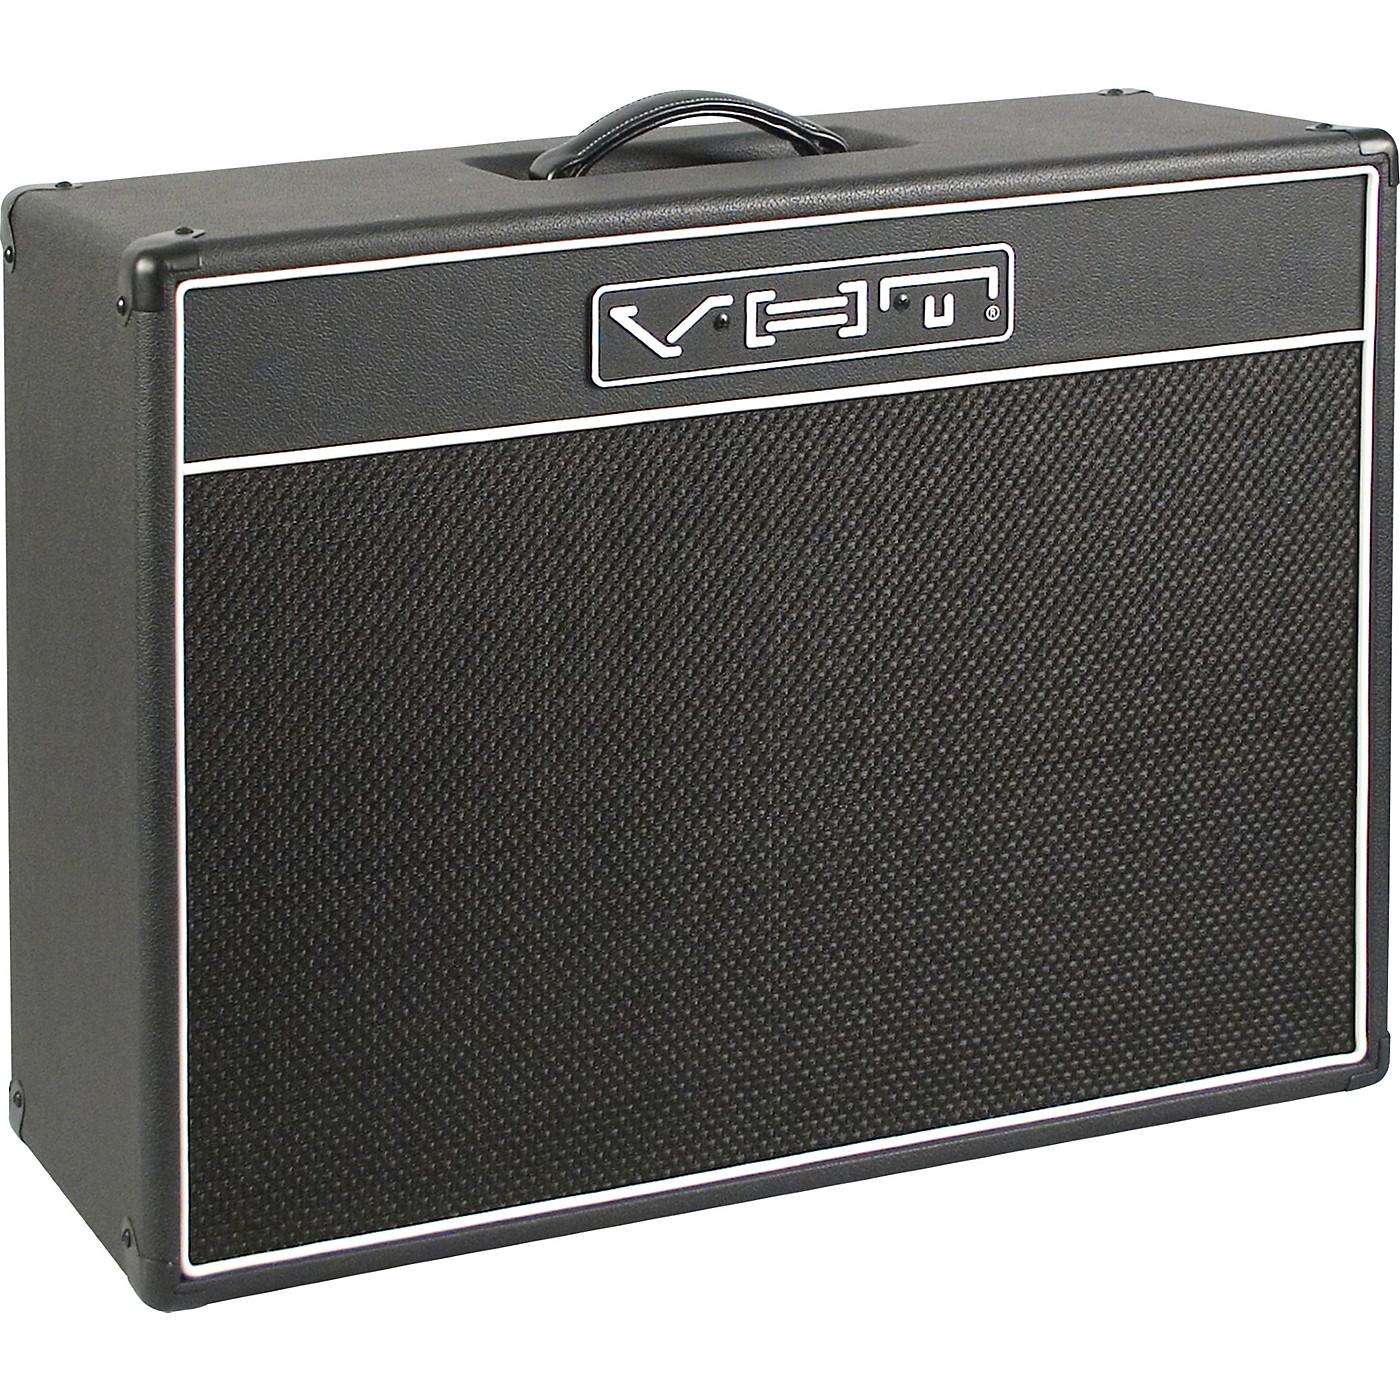 VHT Special 6 212 2x12 Open-Back Guitar Speaker Cabinet with VHT ChromeBack Speakers thumbnail